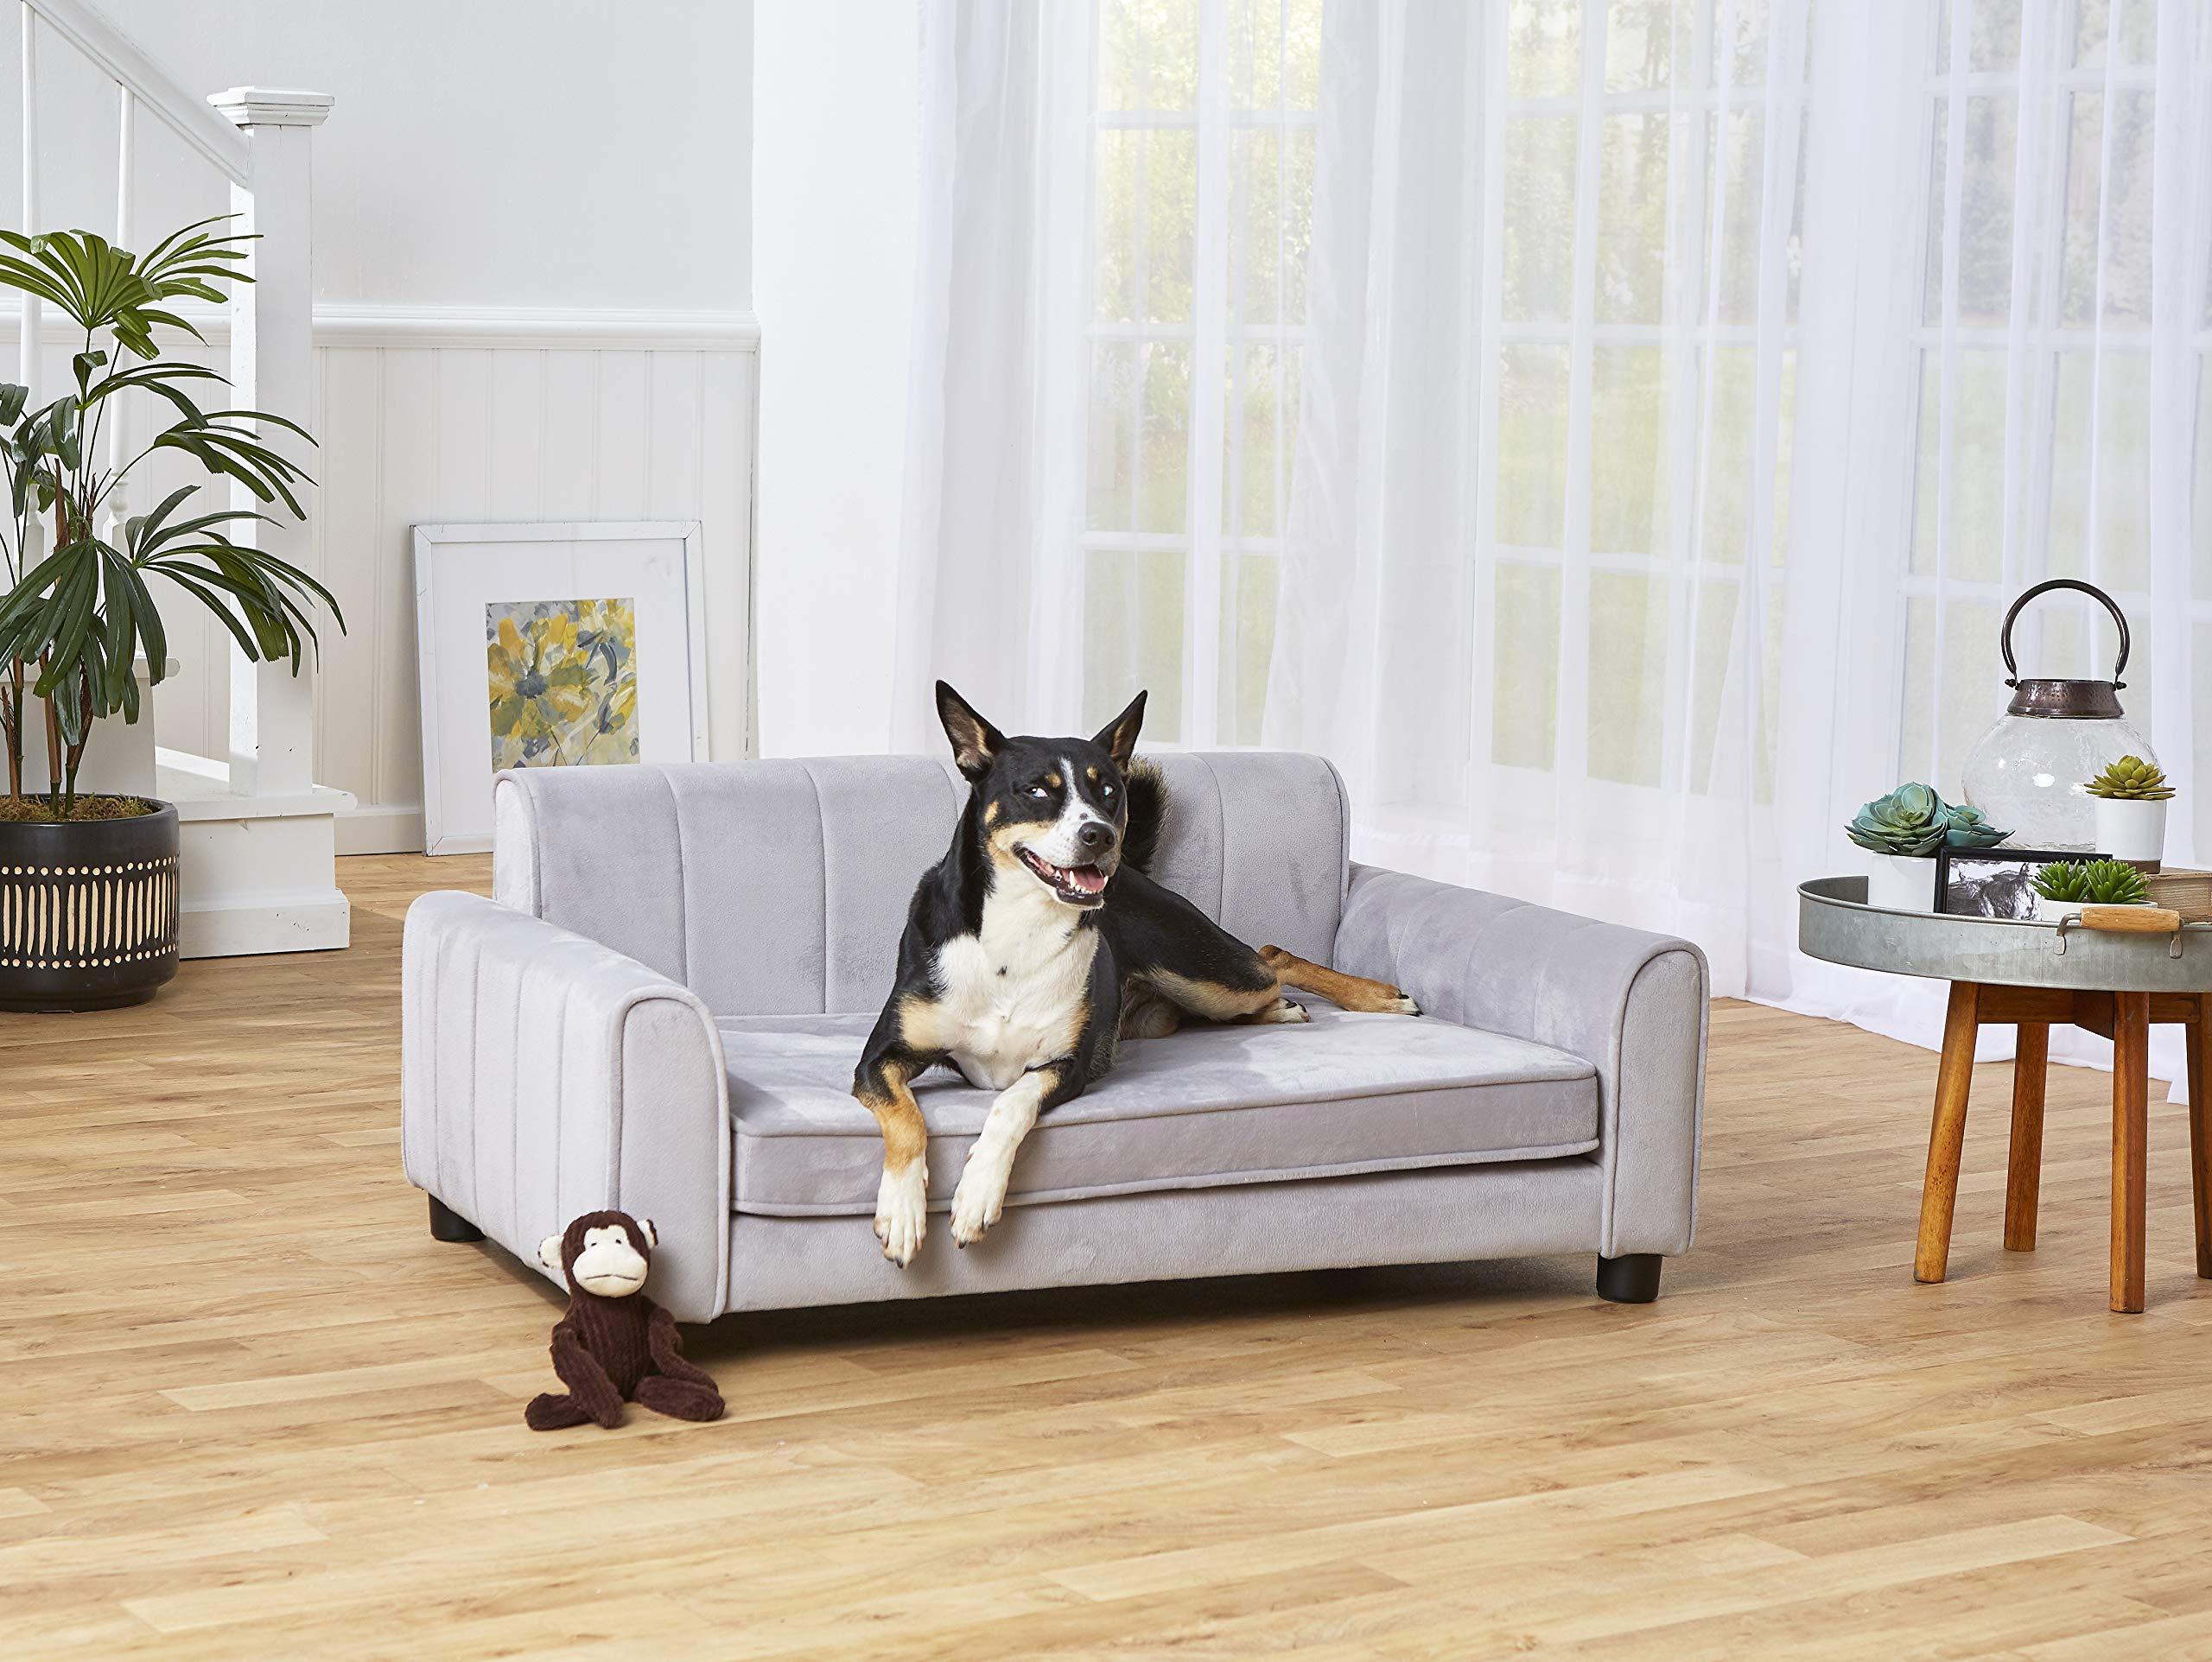 Enchanted Home Pet Ludlow Pet Sofa - Grey by Enchanted Home Pet